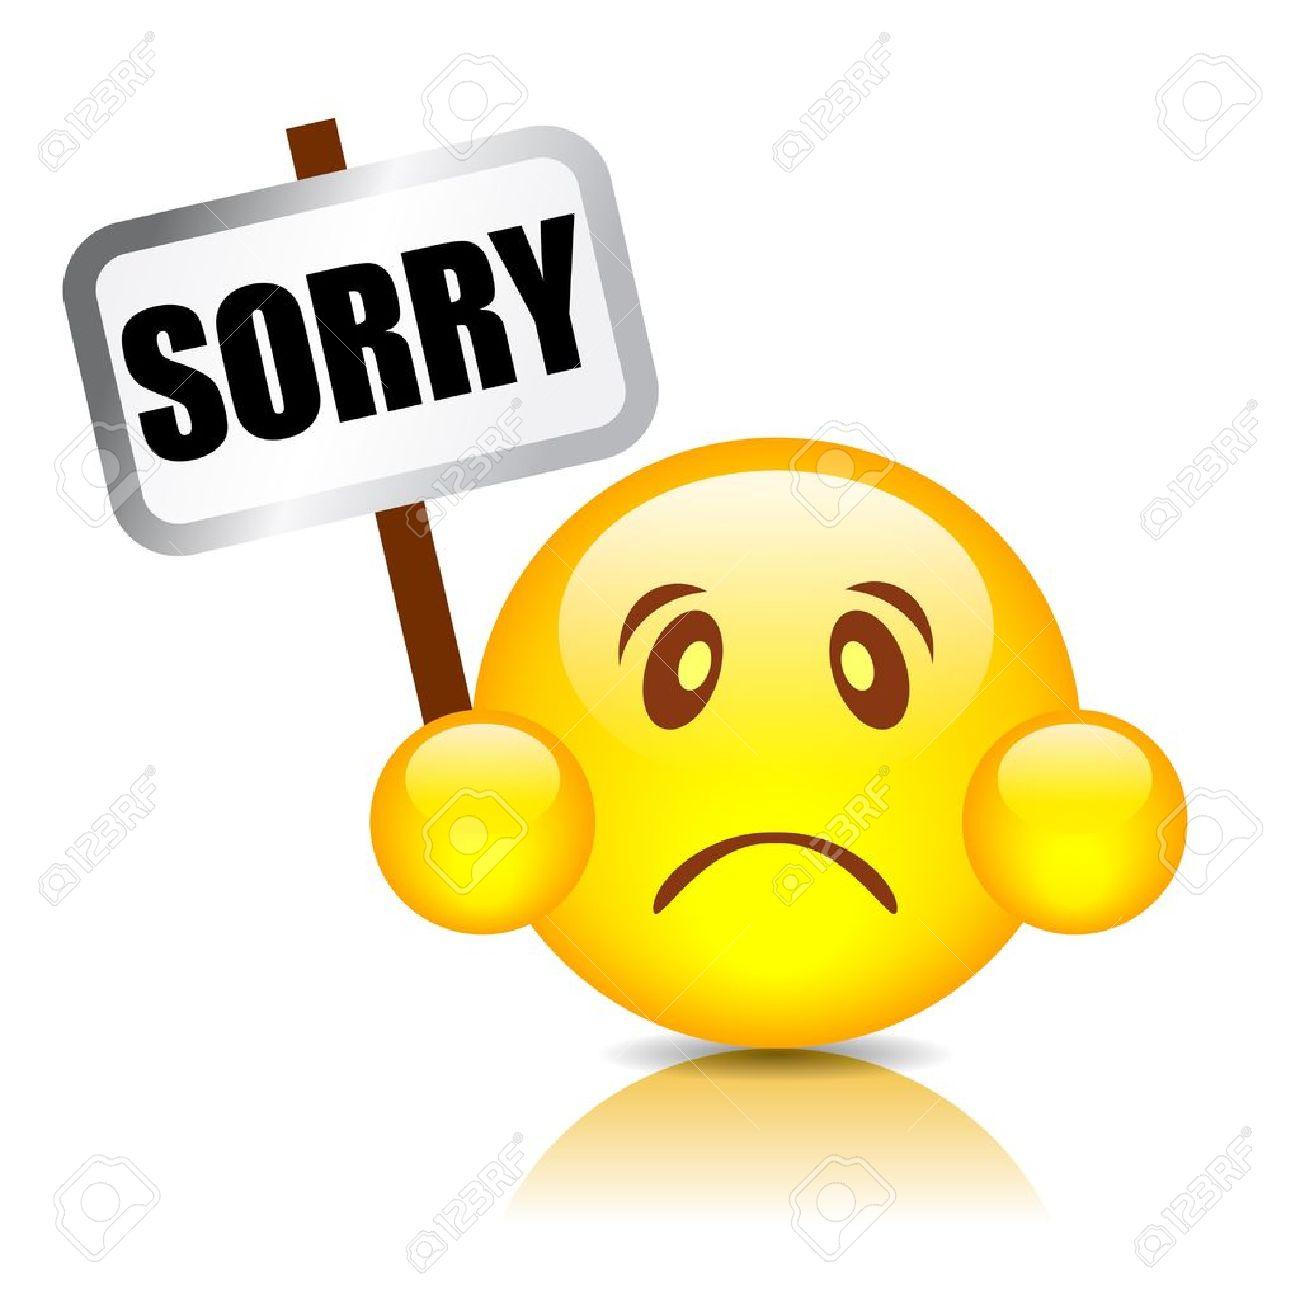 Messenger app is currently under maintenance